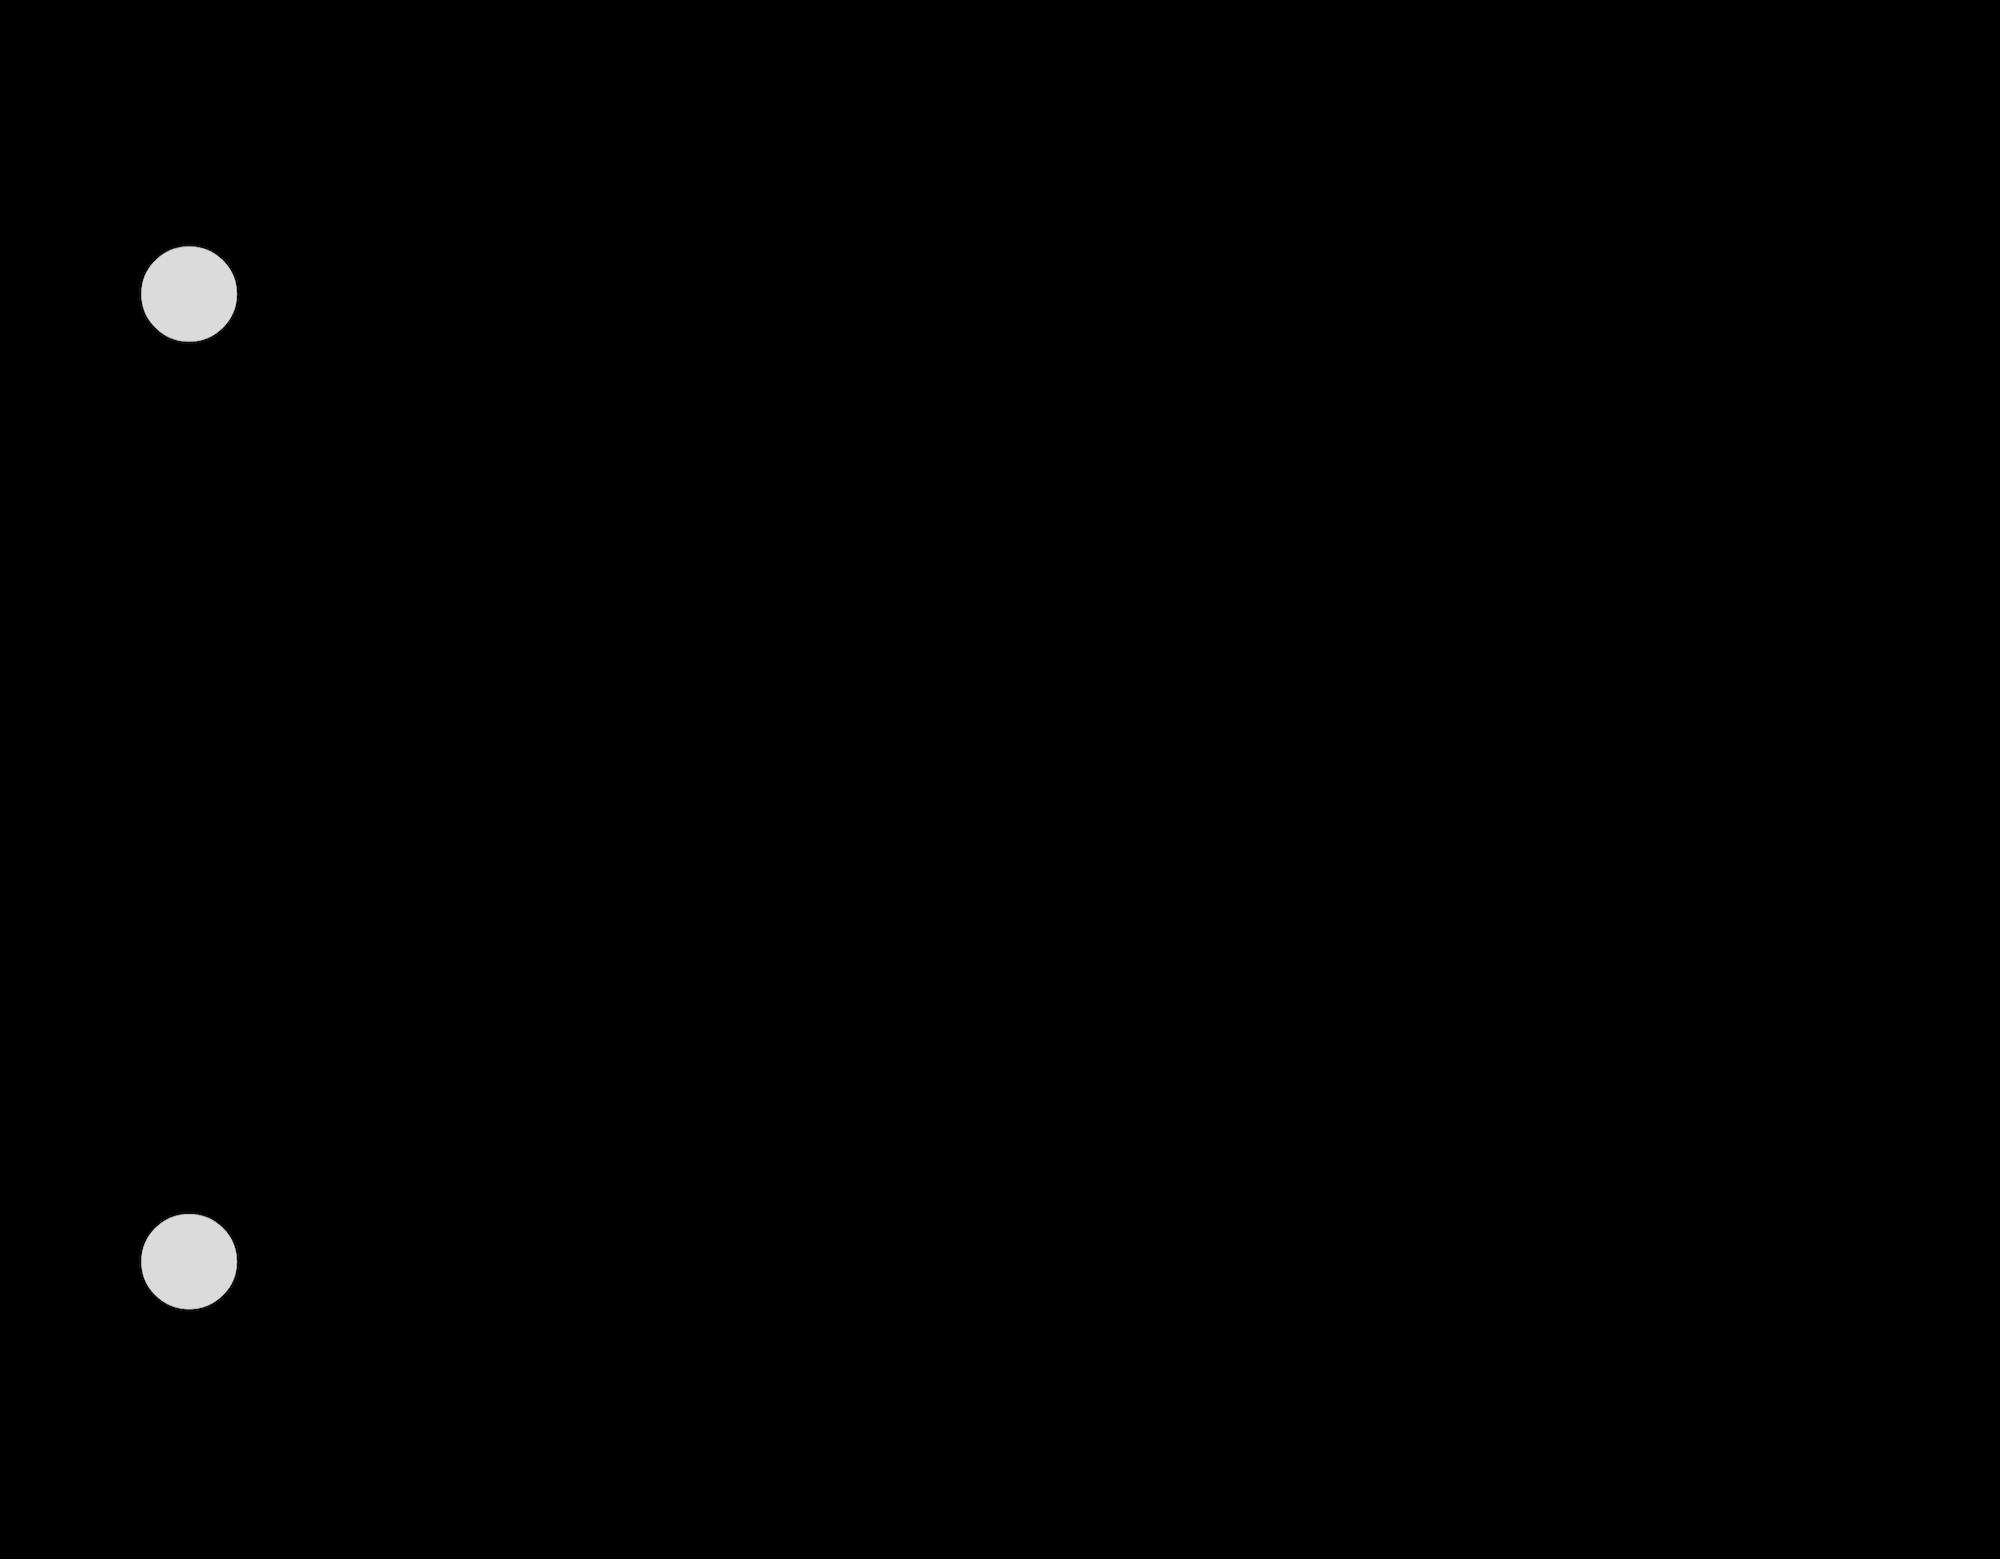 Electrical circuit diagram showing resistors connected in series.